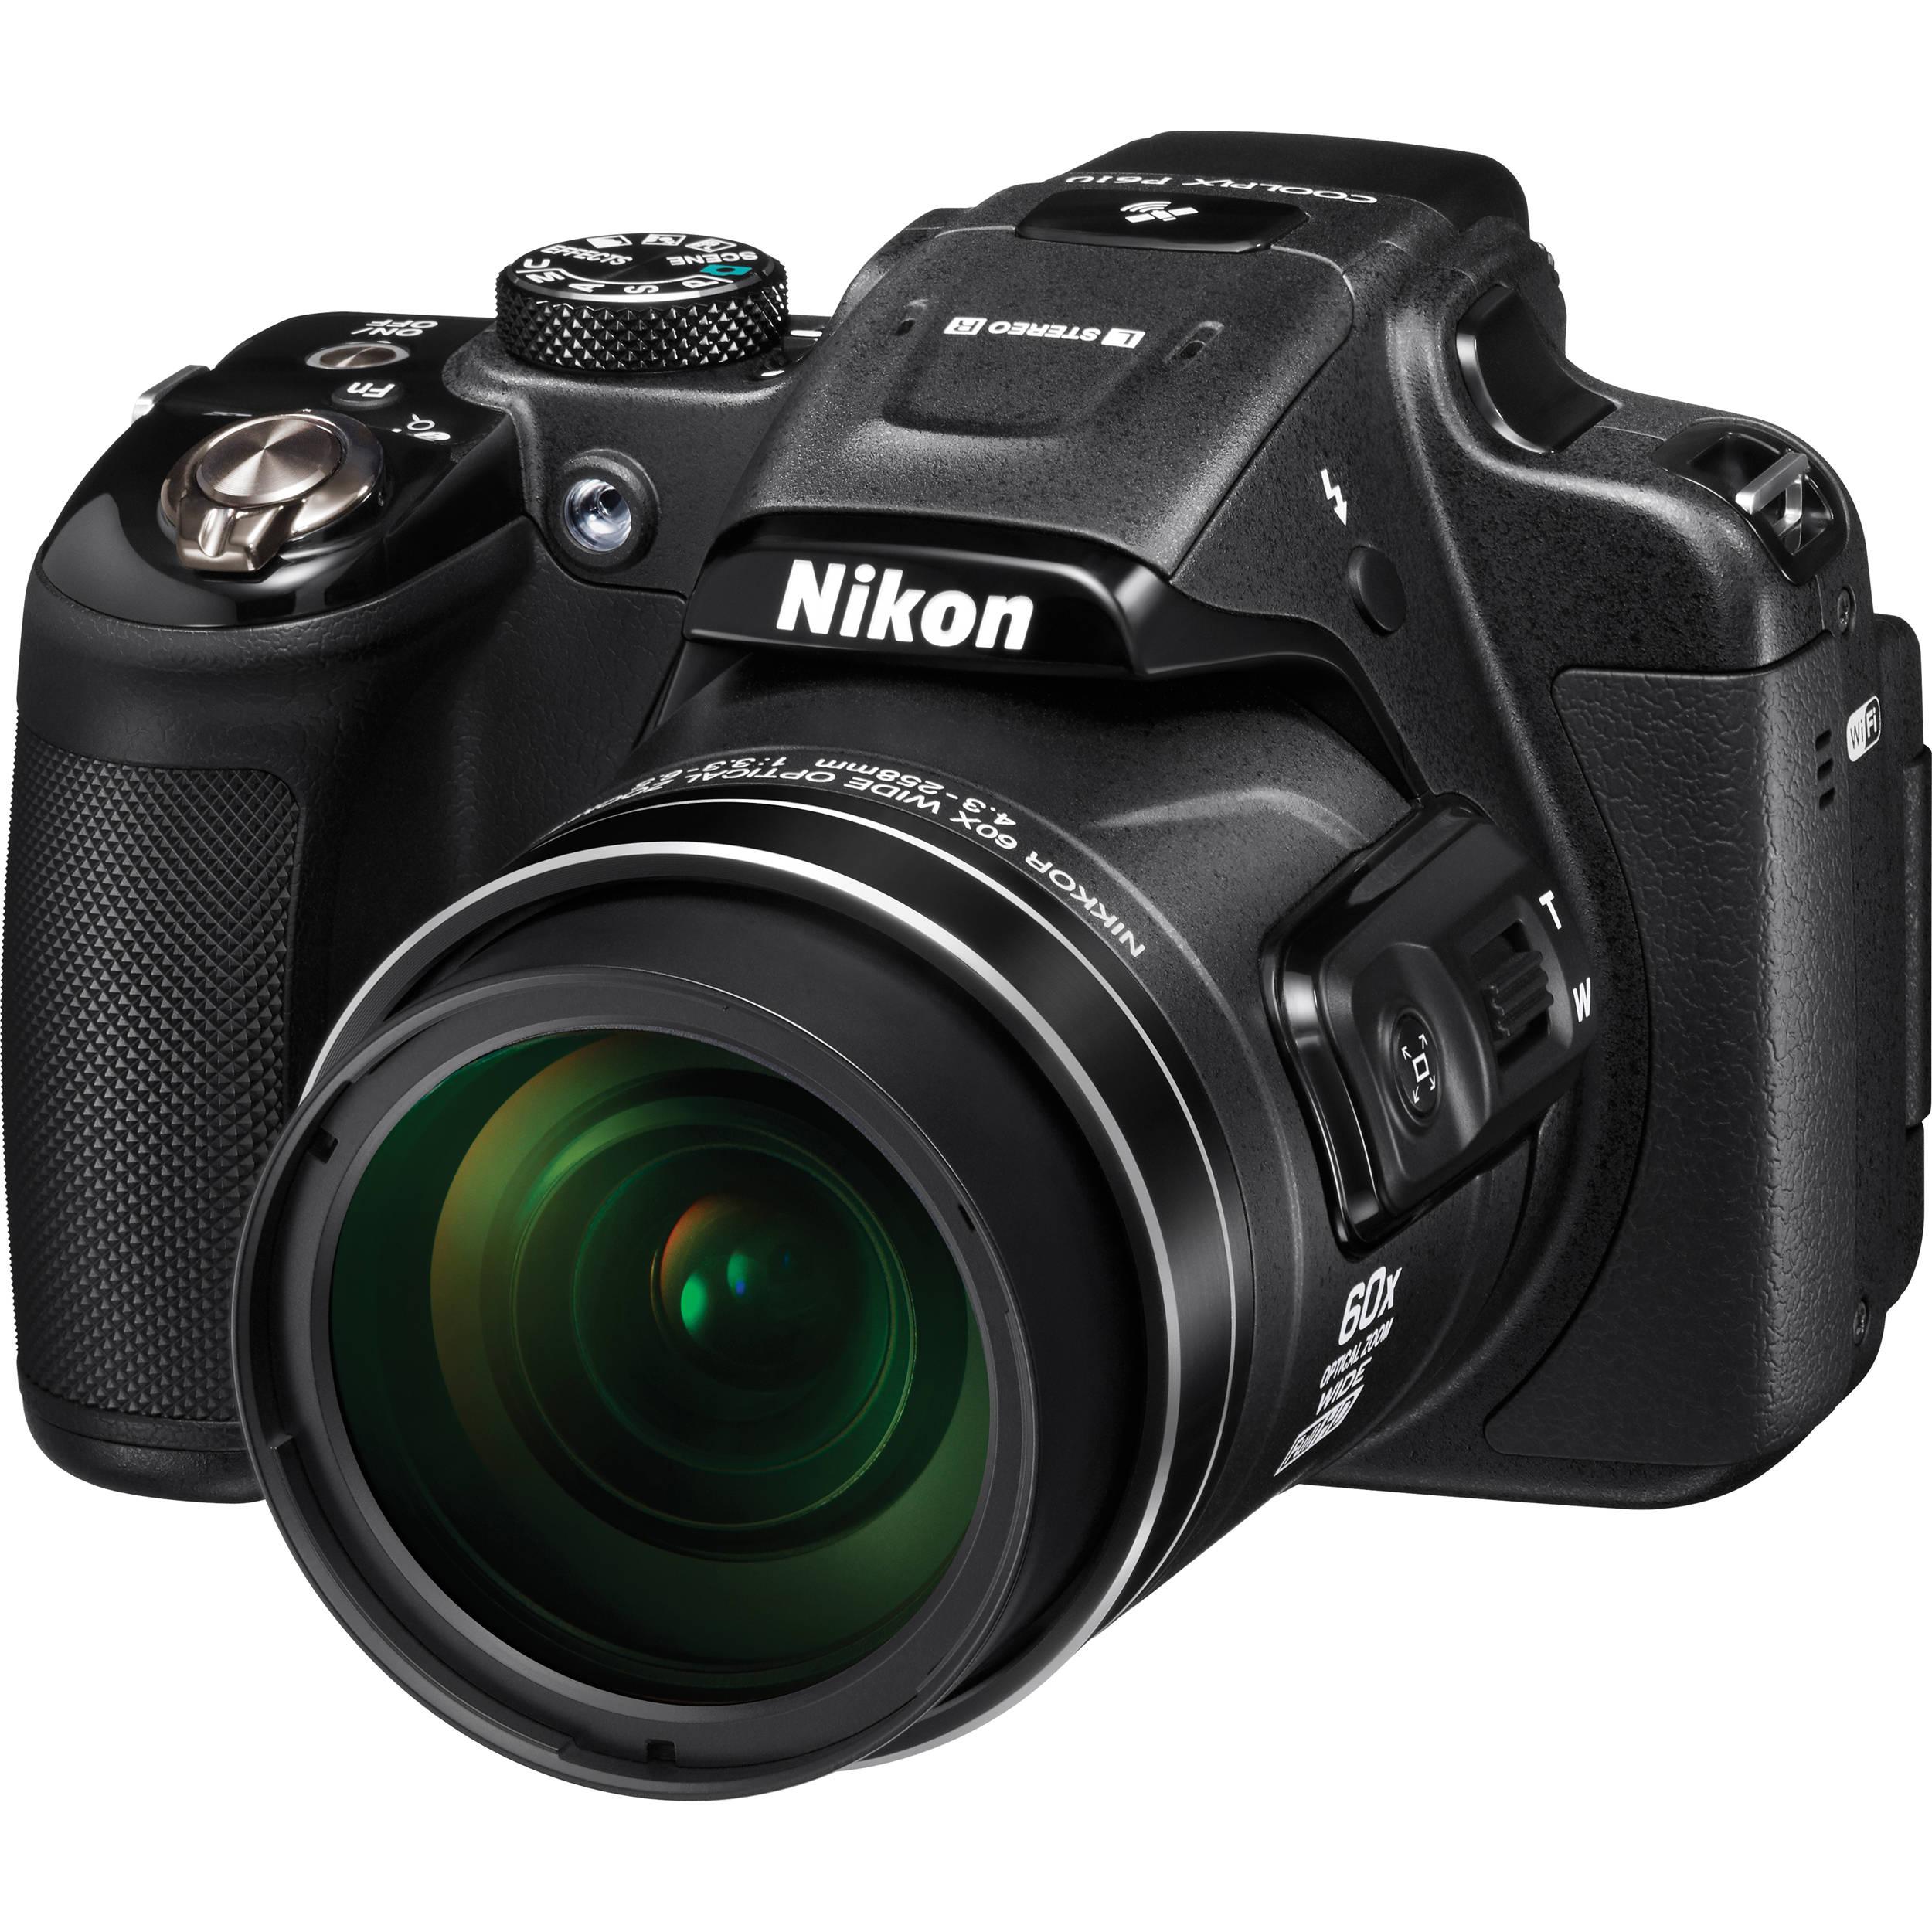 Nikon COOLPIX P610 Digital Camera Black Refurbished B